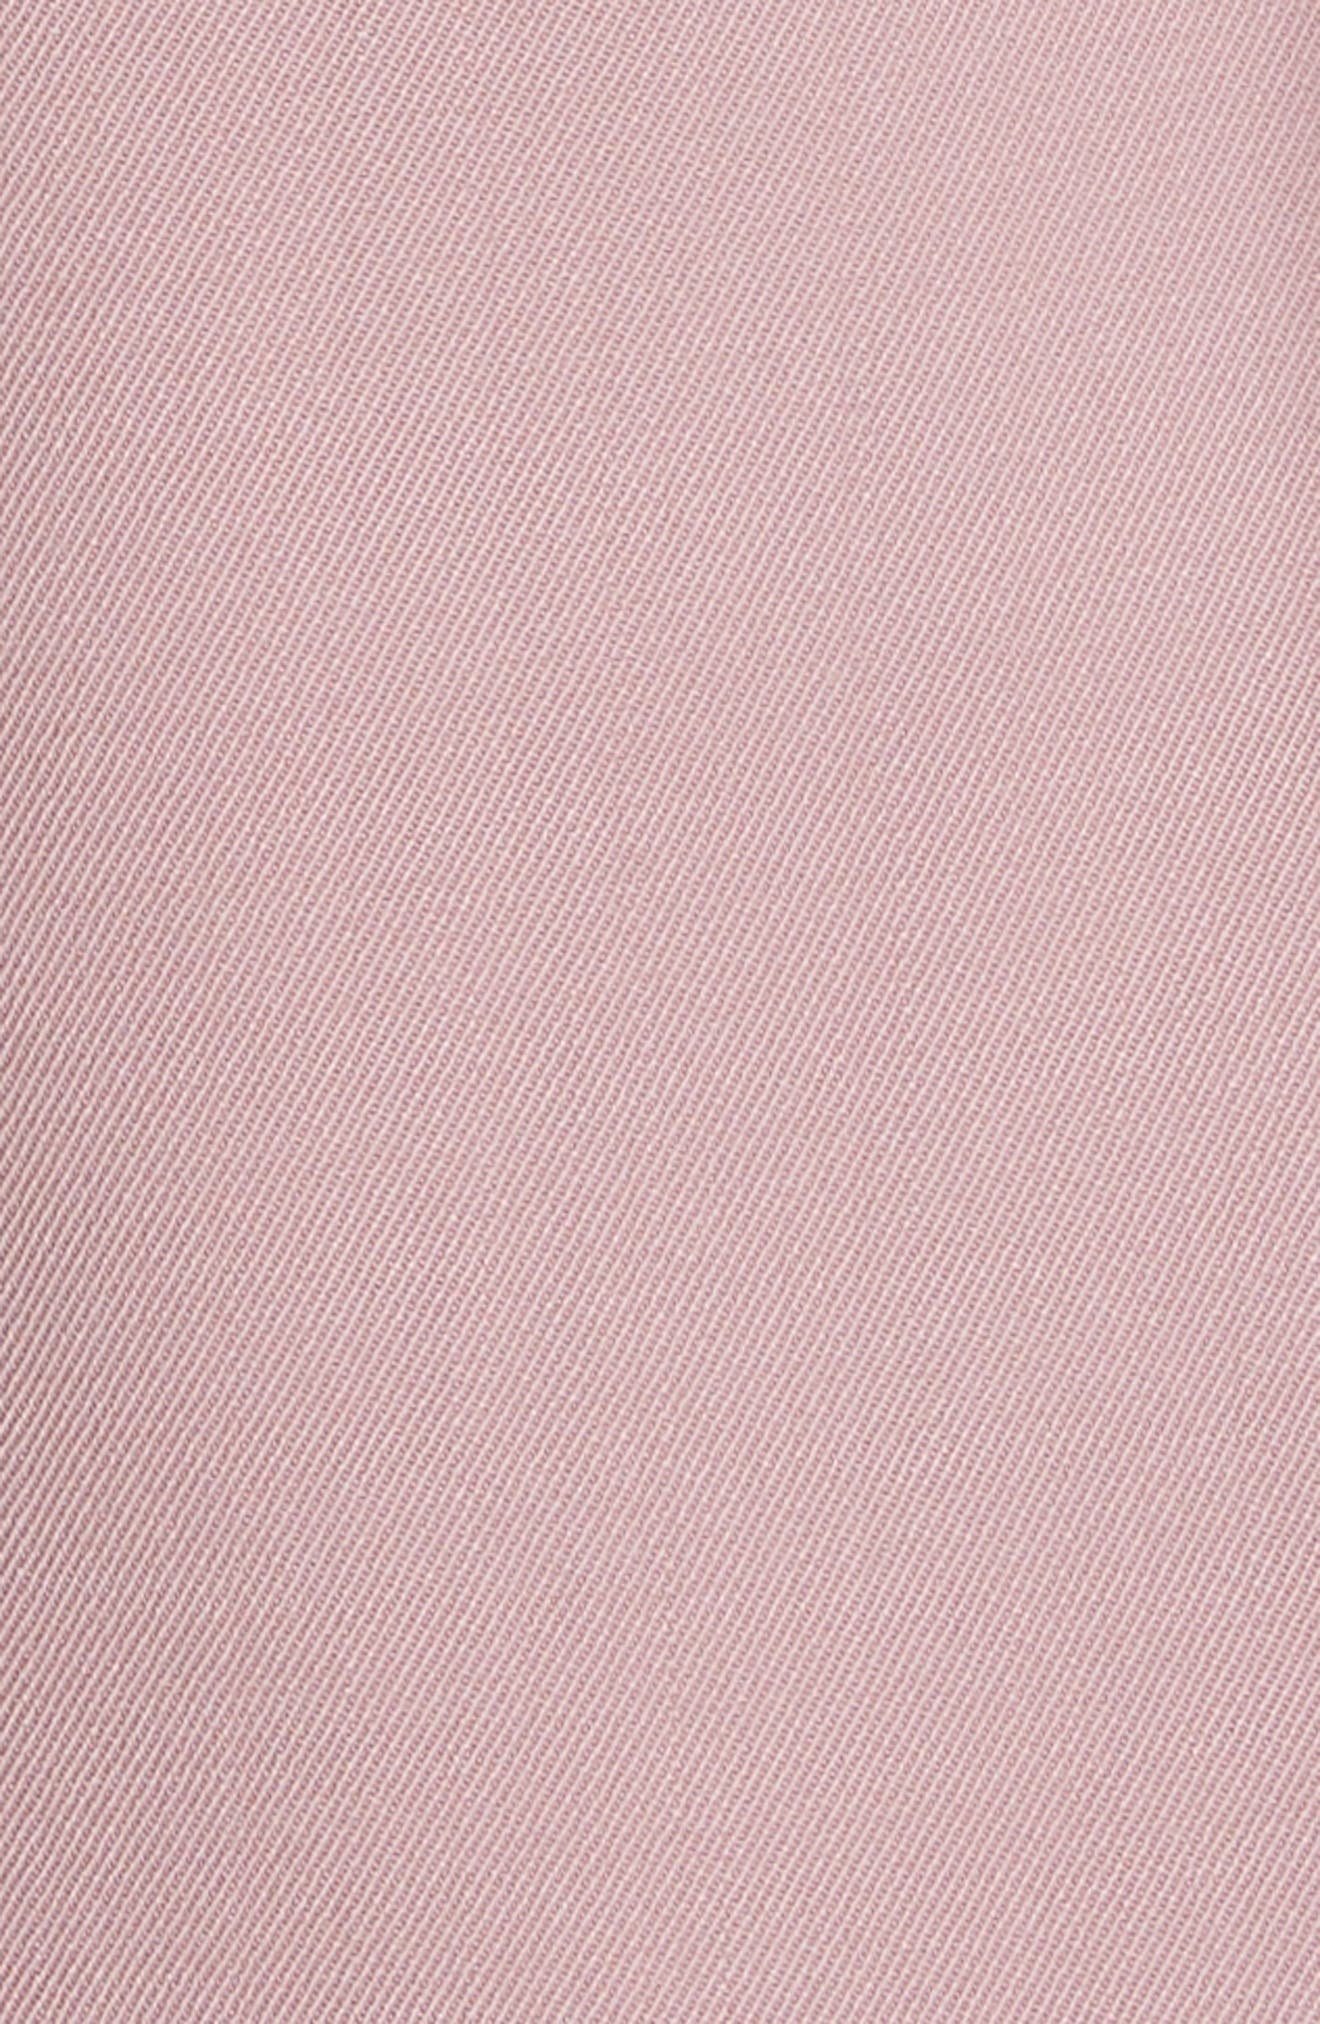 Ruffle Trim Jacket,                             Alternate thumbnail 12, color,